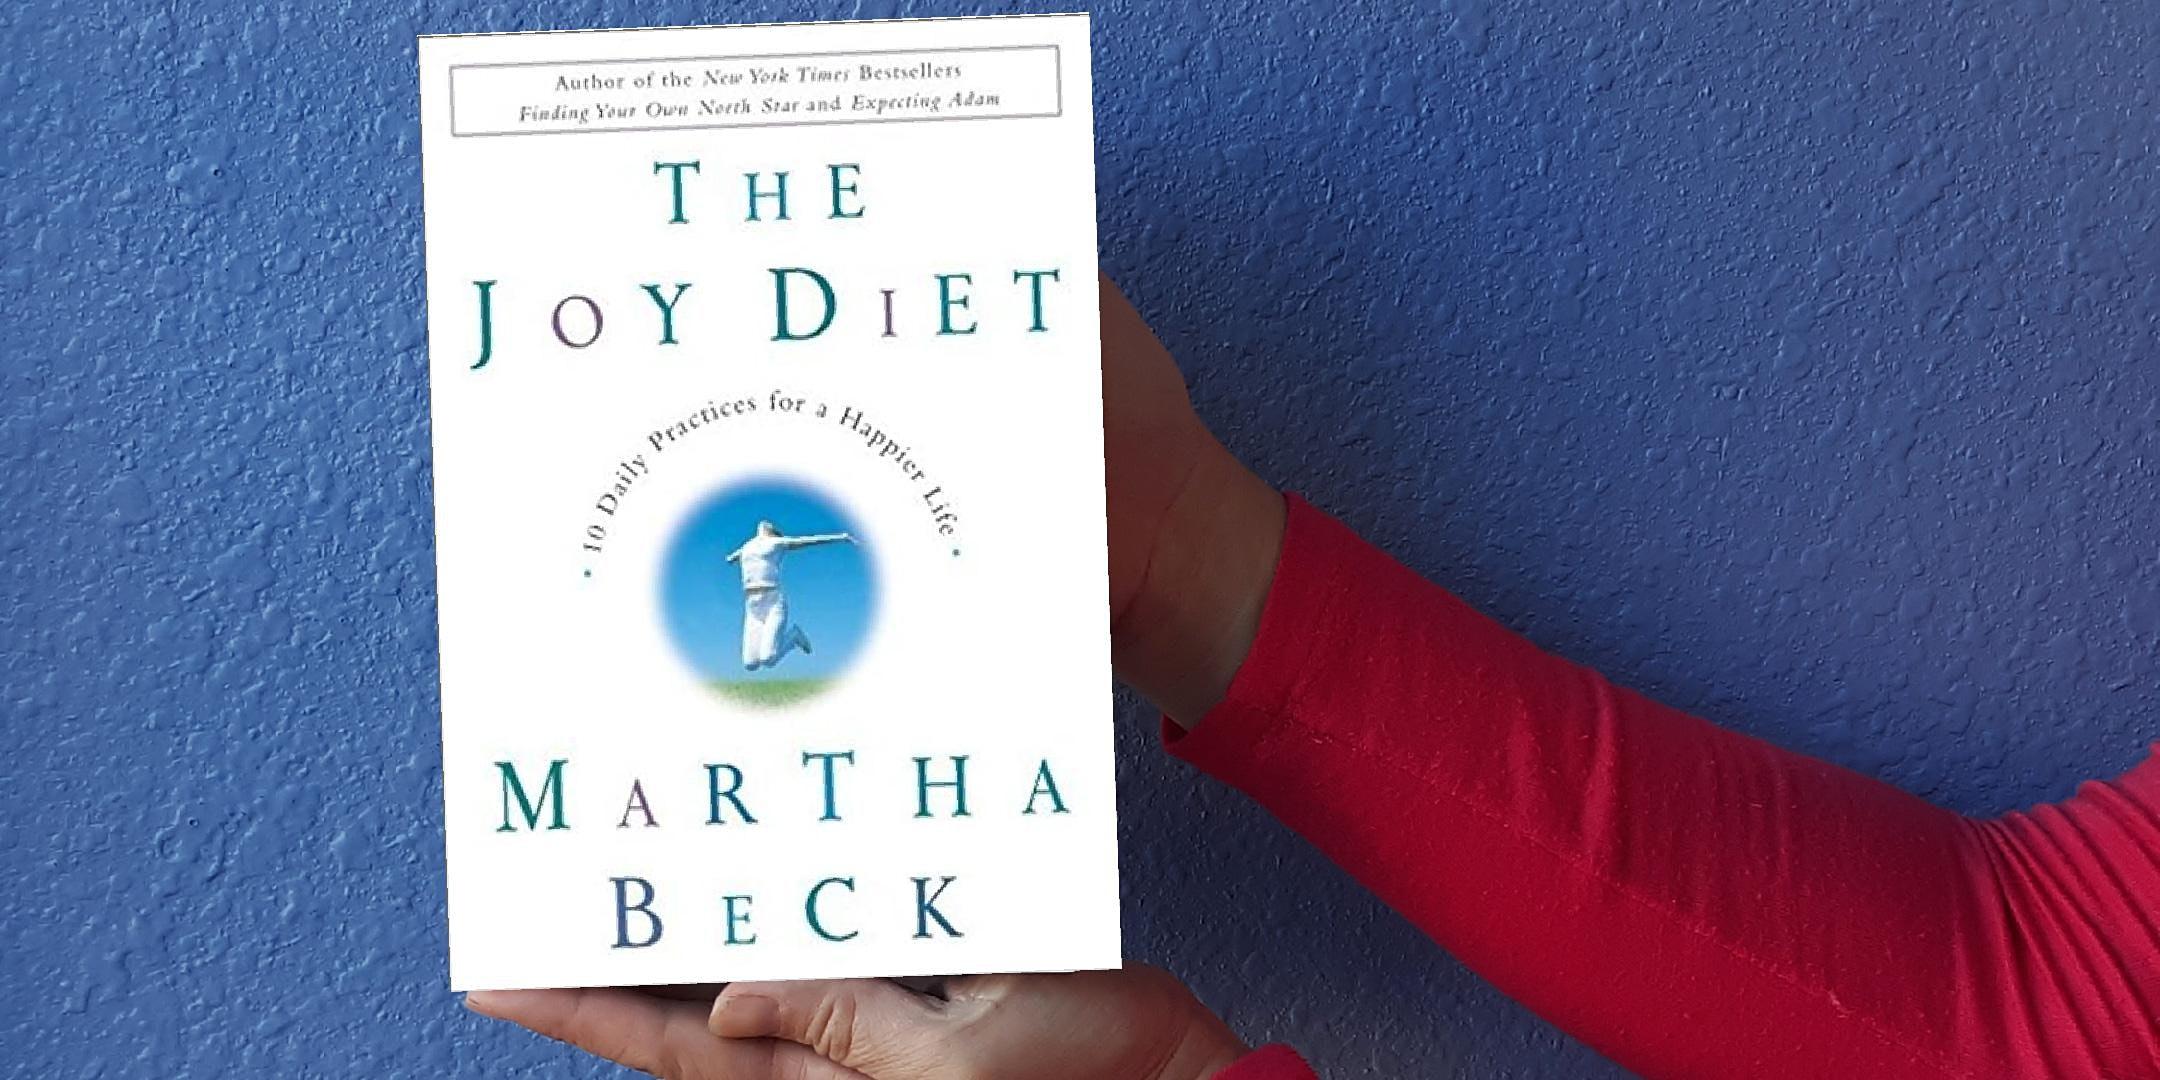 What's Next? Book Club - The Joy Diet